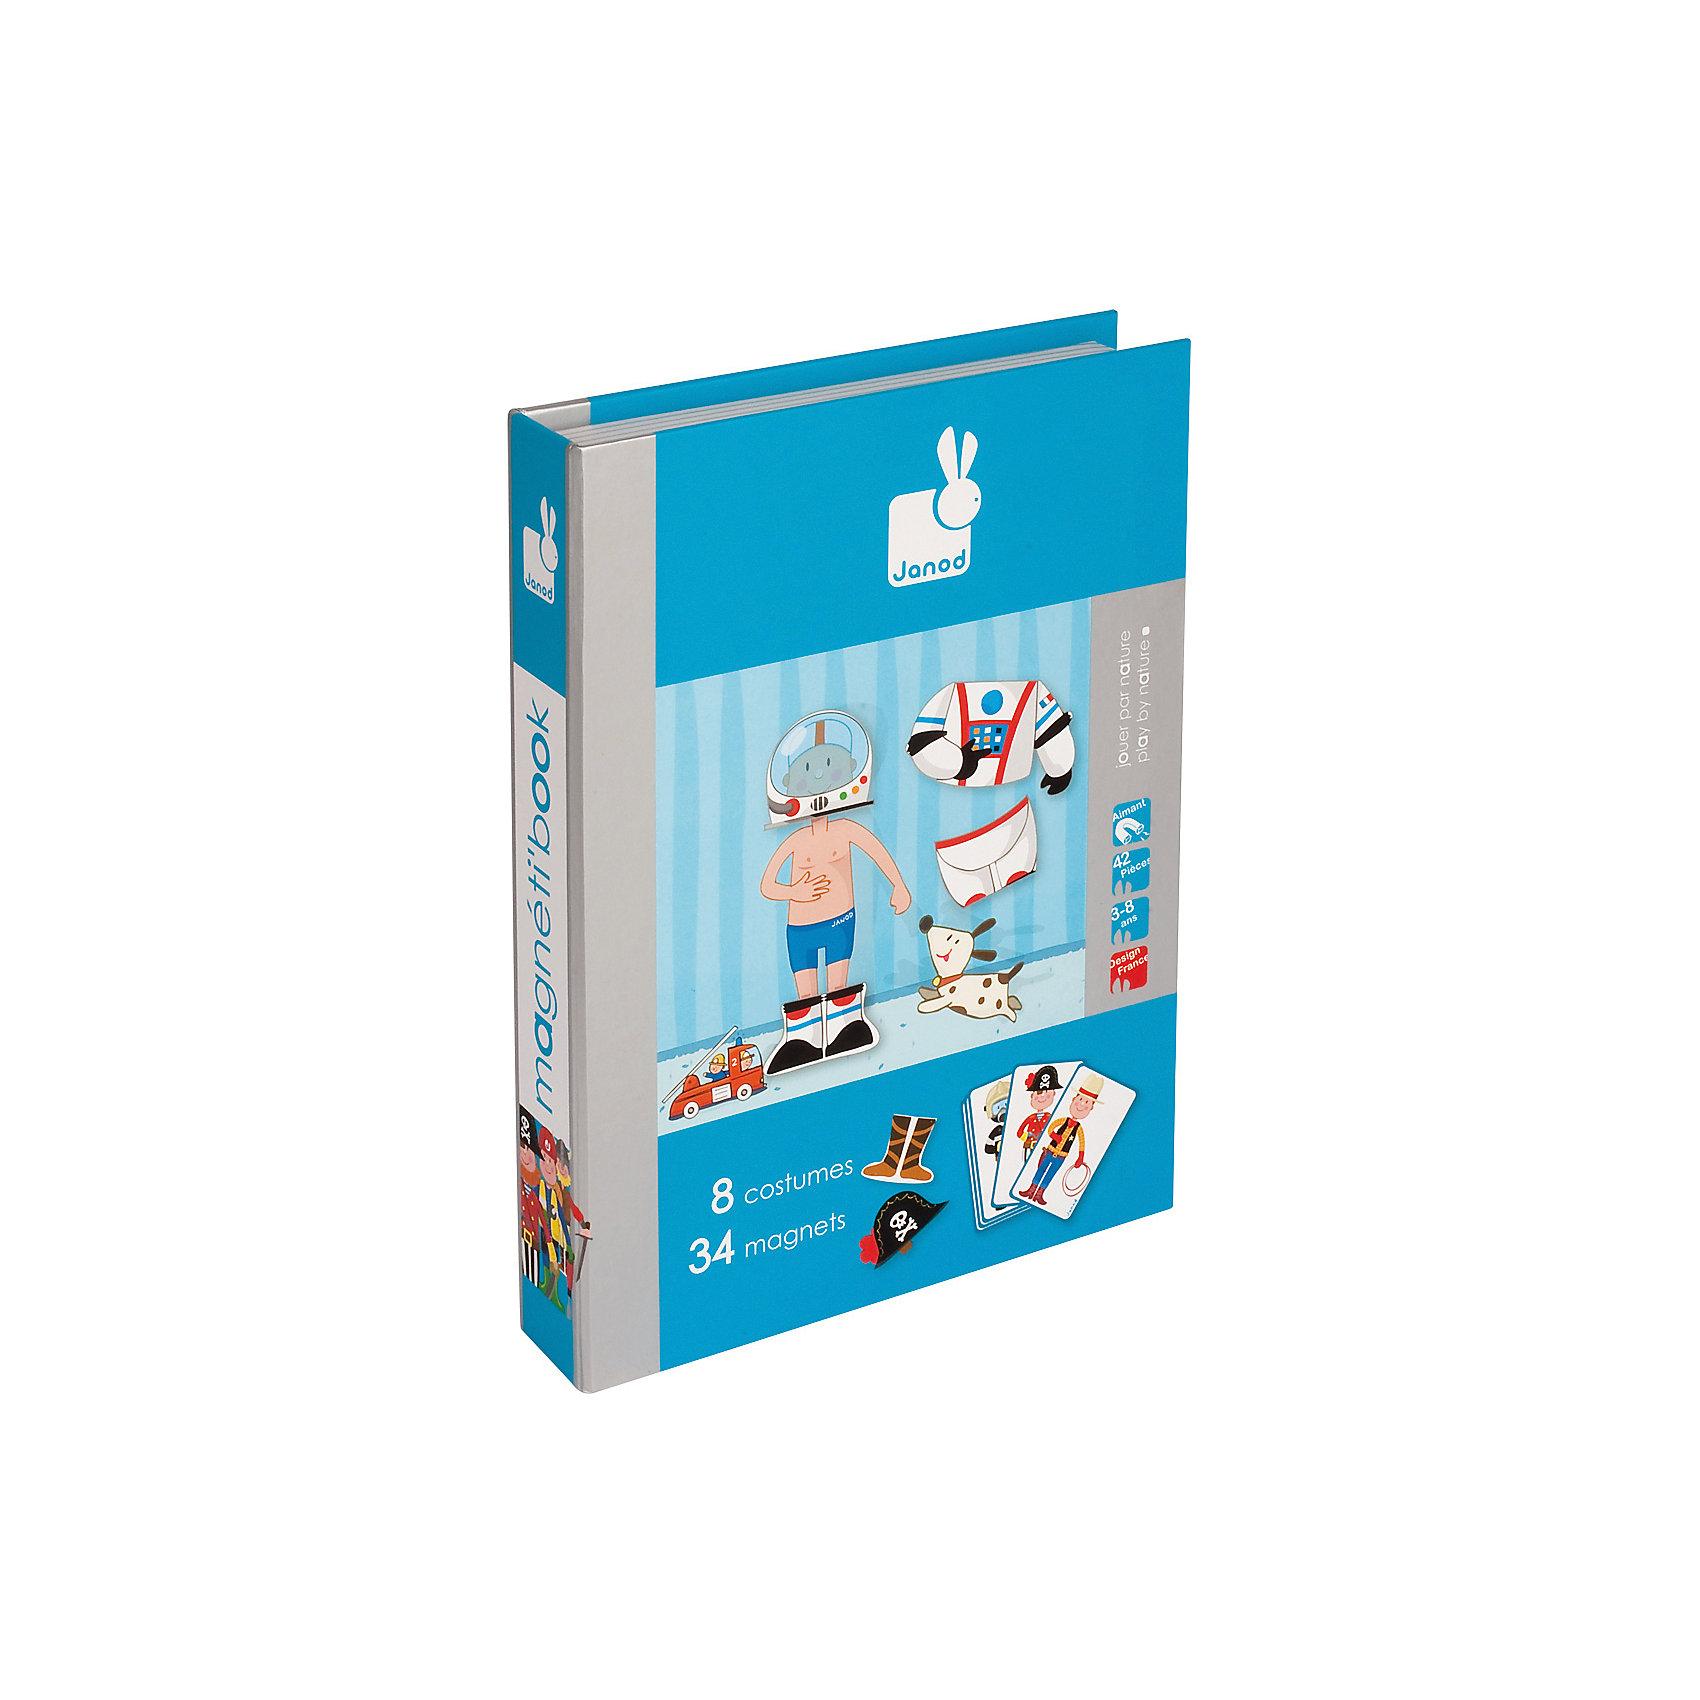 "Магнитная книга-игра ""Мальчишки в костюмах"", Janod от myToys"